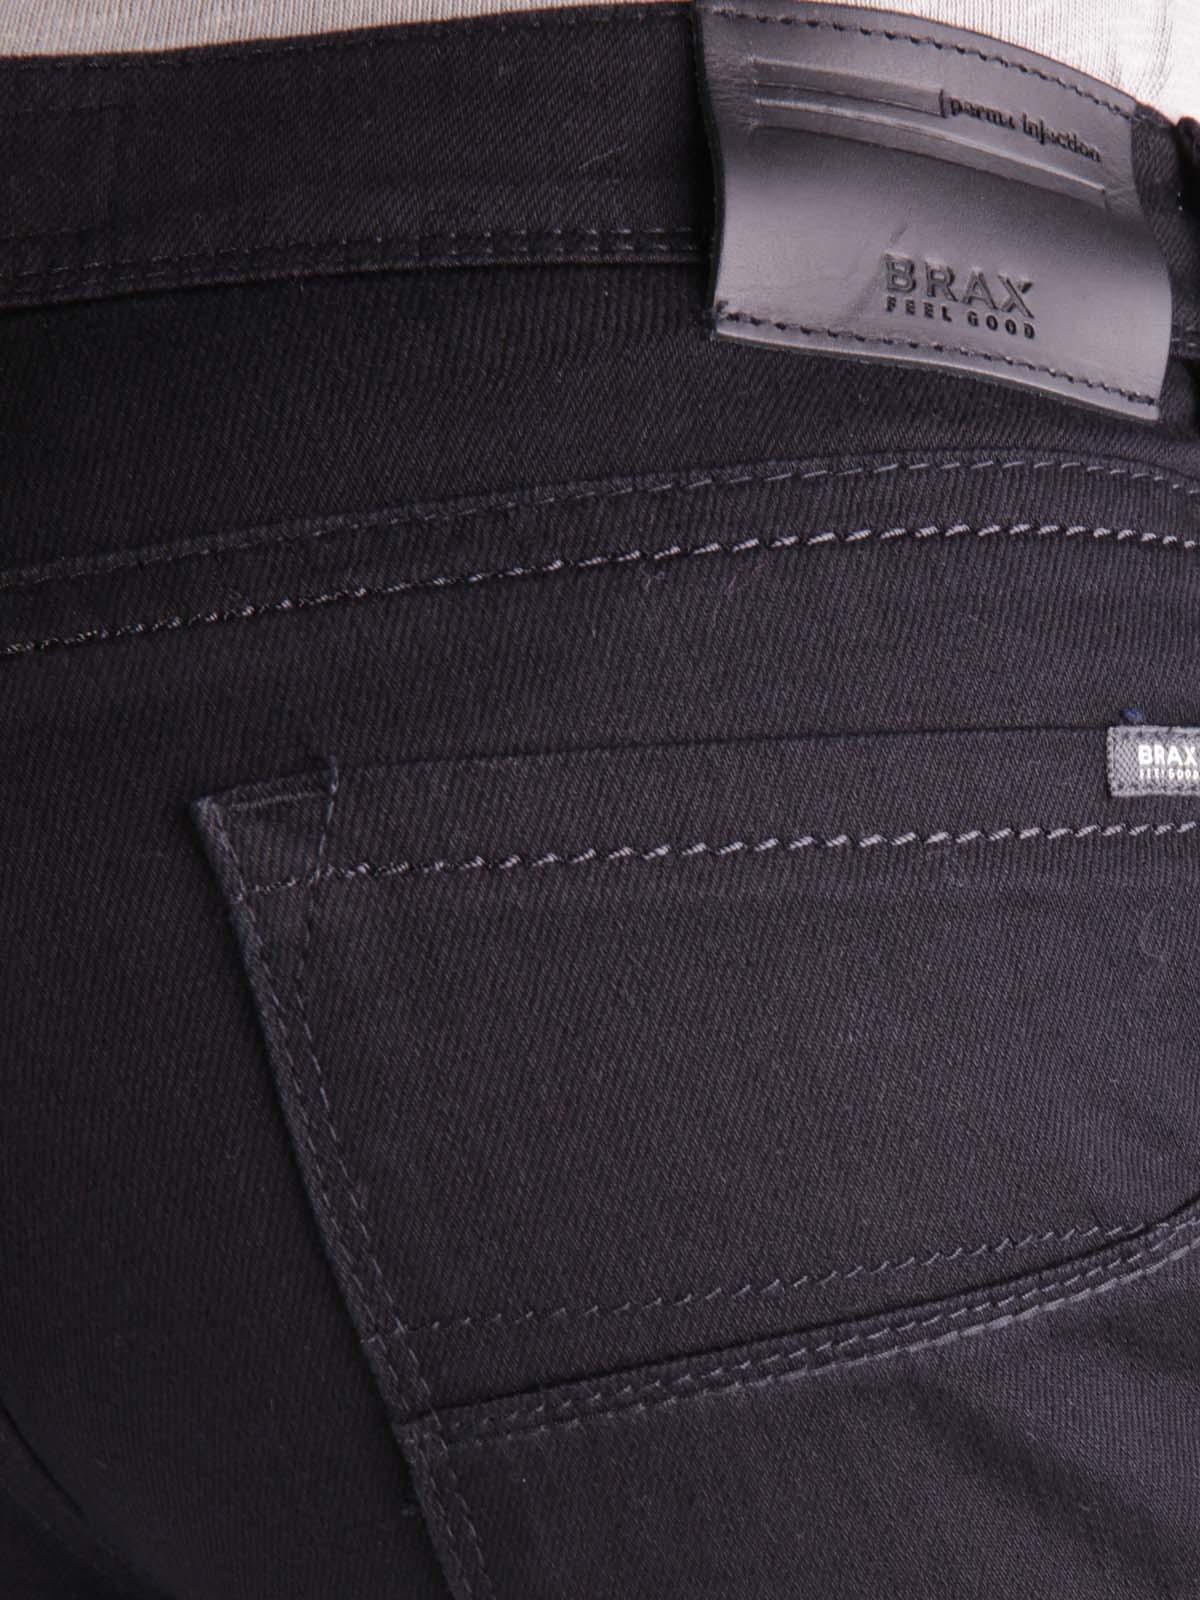 buying new cheapest price amazing selection Brax Cadiz Jeans perma black W31/L32